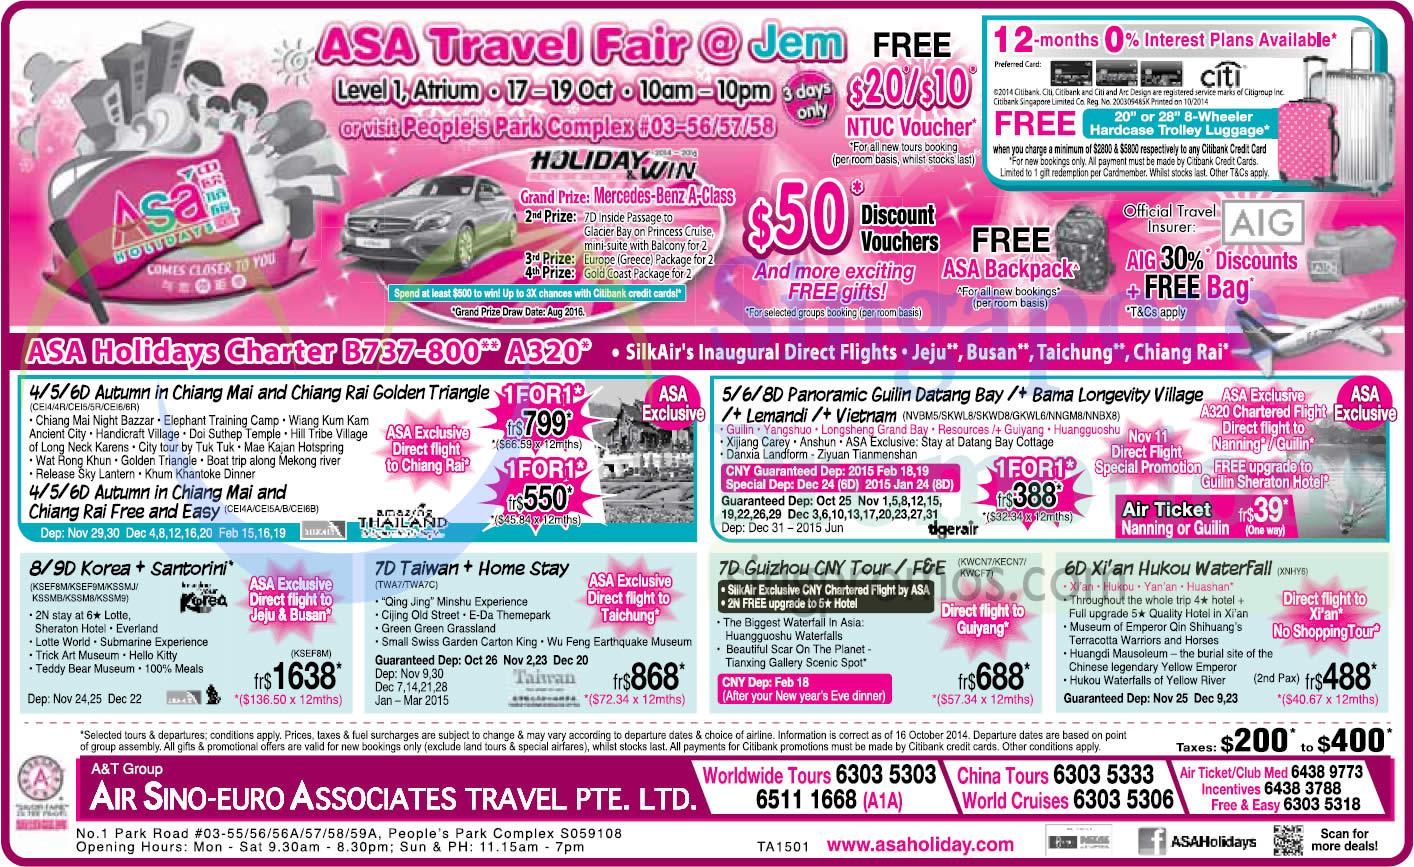 ASA Travel Fair 17 Oct 2014